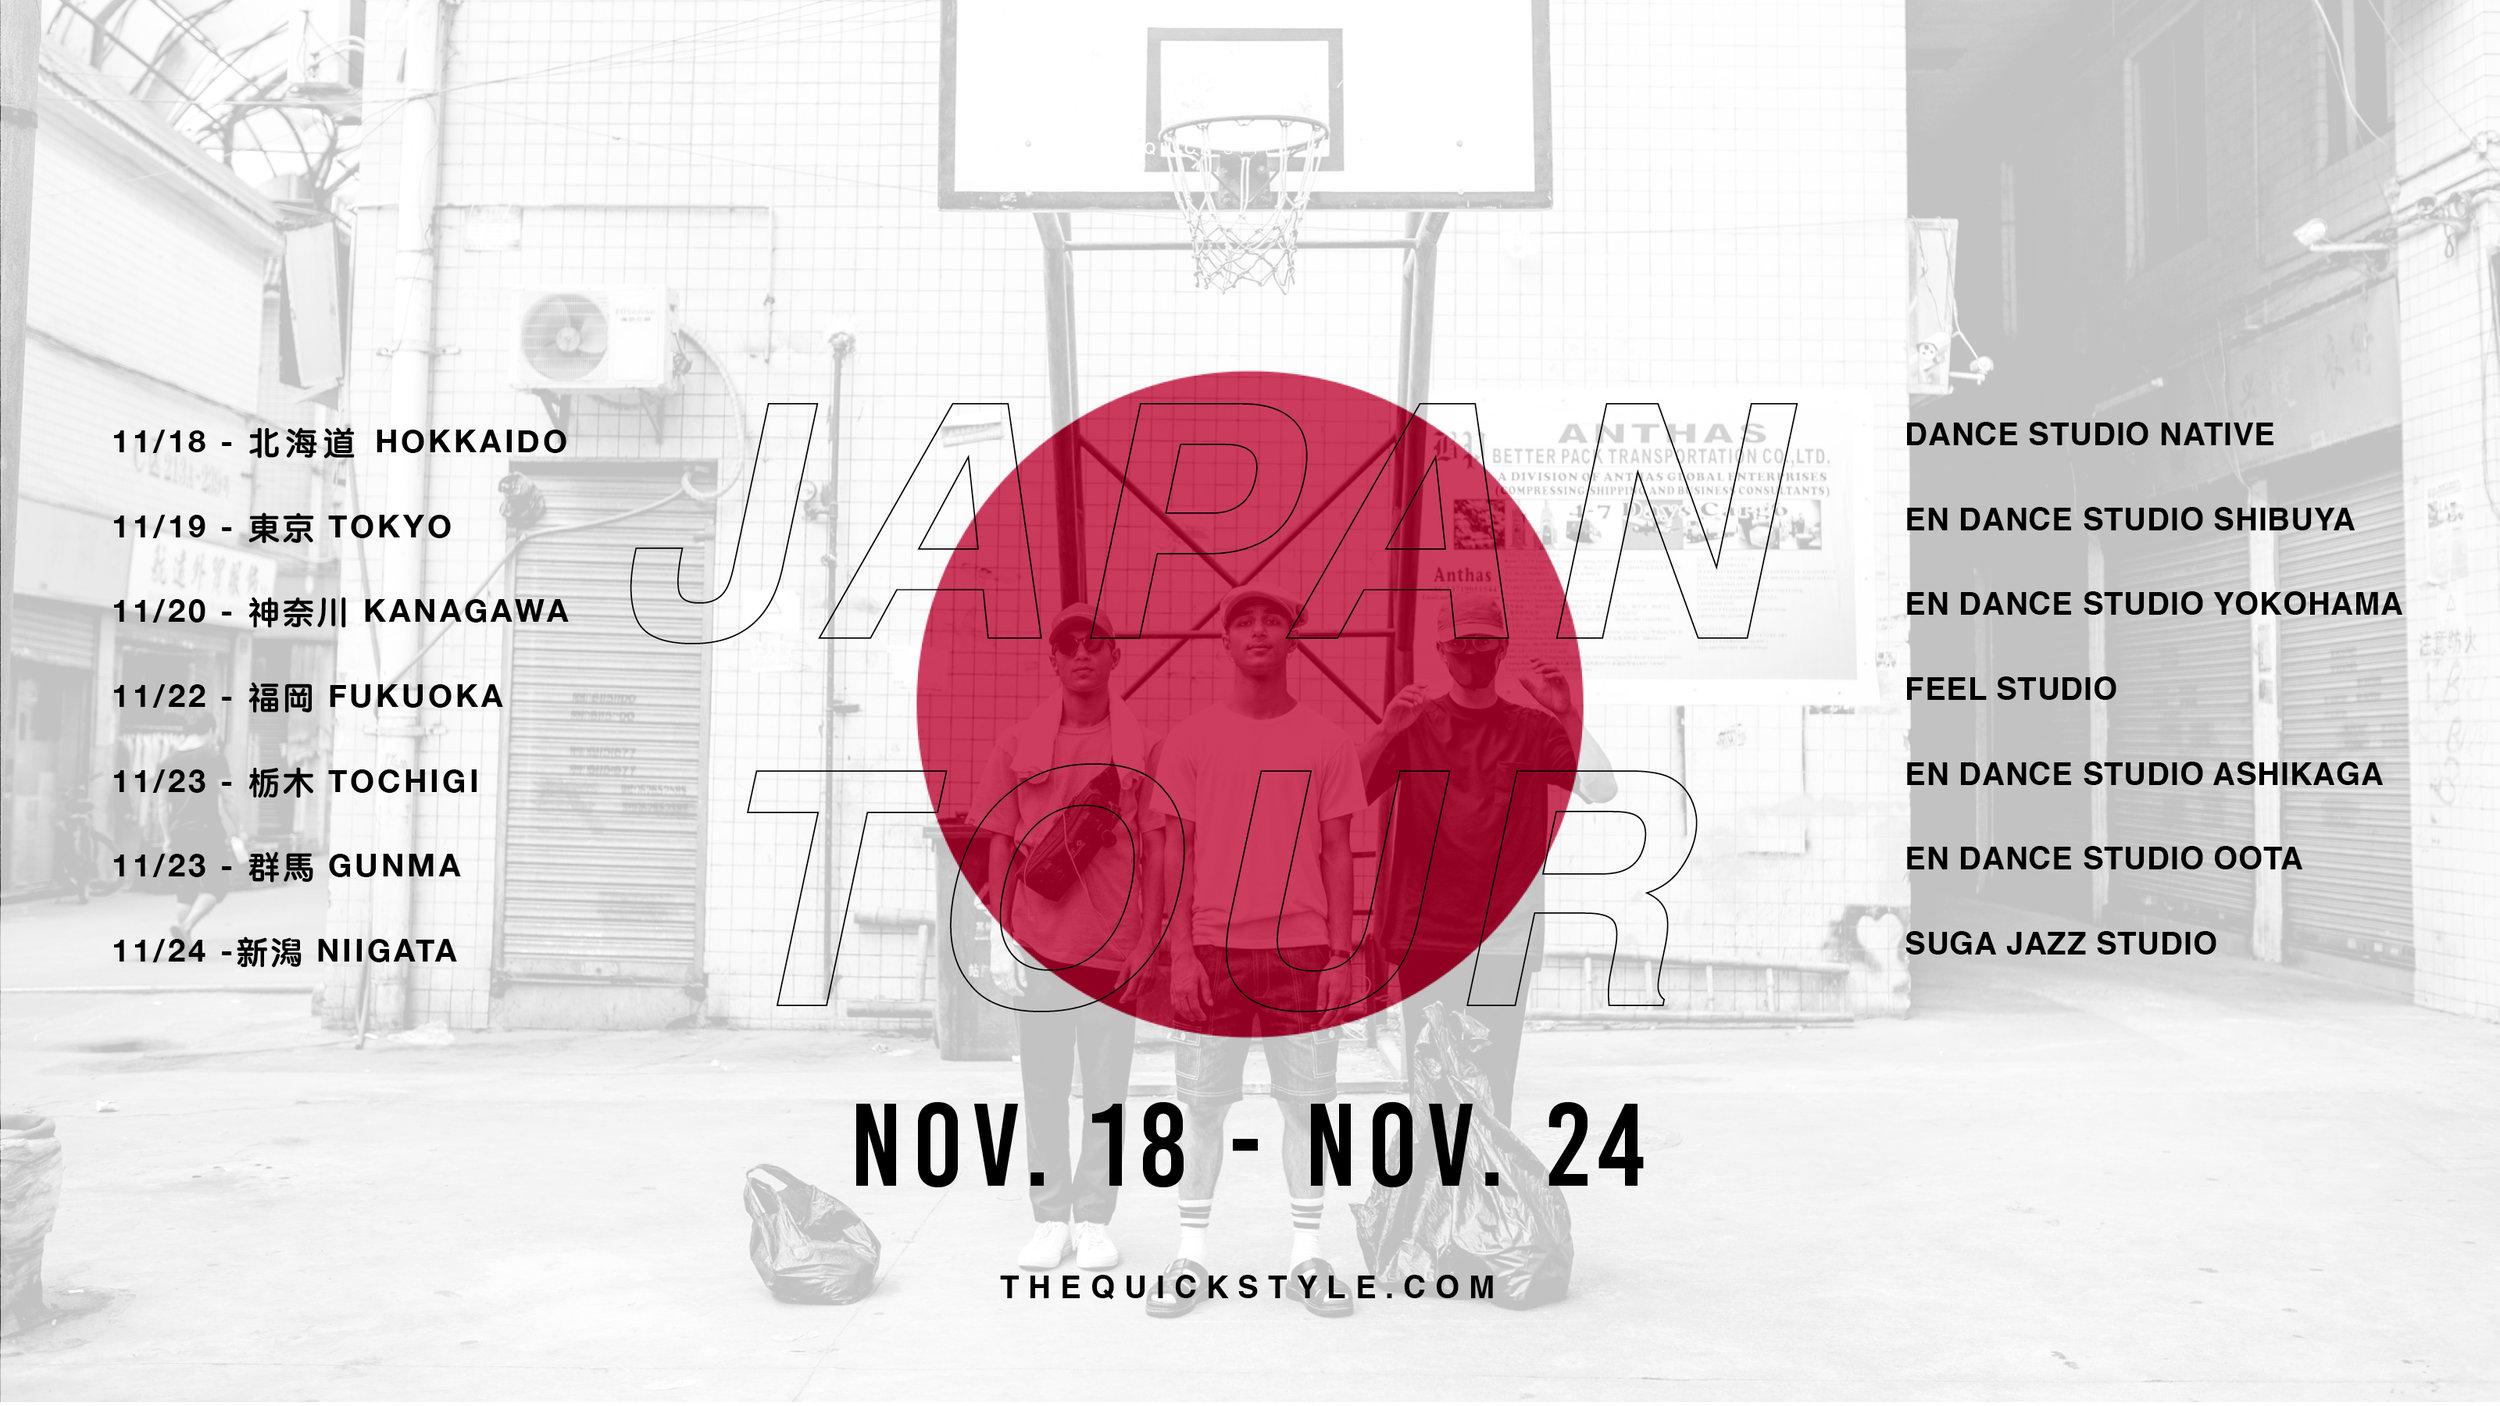 Quick Crew is coming to Japan this November. We are looking forward to holding workshops in different parts of Japan. Come and join us this November with fun and exciting creative workshops. We are looking forward to meeting you all! - 今月、Quick Style WSジャパンツアーを急遽開催する事となりました! もし開催地近くにお住まいの方々は是非参加してください。 以前WSに参加してくれたダンサーから初めてのダンサーまでみんなに会える事を楽しみにしてます - Quick Style - Japan Tour 2016:  11/18 北海道 (Hokkaido) - Dance Studio NATIVE. ① 18:30-20:00 ② 20:30-22:00 - 11/19 東京 (Tokyo) - En Dance Studio Shibuya ① 18:00-19:30 ② 19:45-21:15 - 11/20 神奈川 (Kanagawa) - En Dance Studio Yokohama ① 19:30-21:00 ② 21:15-22:45 _ 11/22 福岡 (Fukuoka) - Feel Studio ① 19:00-20:30 ② 20:45 - 22:15 - 11/23 栃木 (Tochigi) - En Dance Studio Ashikaga ① 18:00-19:30 群馬 (Gunma) - En Dance Studio Oota ② 21:00-22:30 - 11/24 新潟 (Niigata) - Suga Jazz Studio ① 18:30-20:00 ② 20:00-21:30  Join the event here: Quick Style - Japan Tour 2016